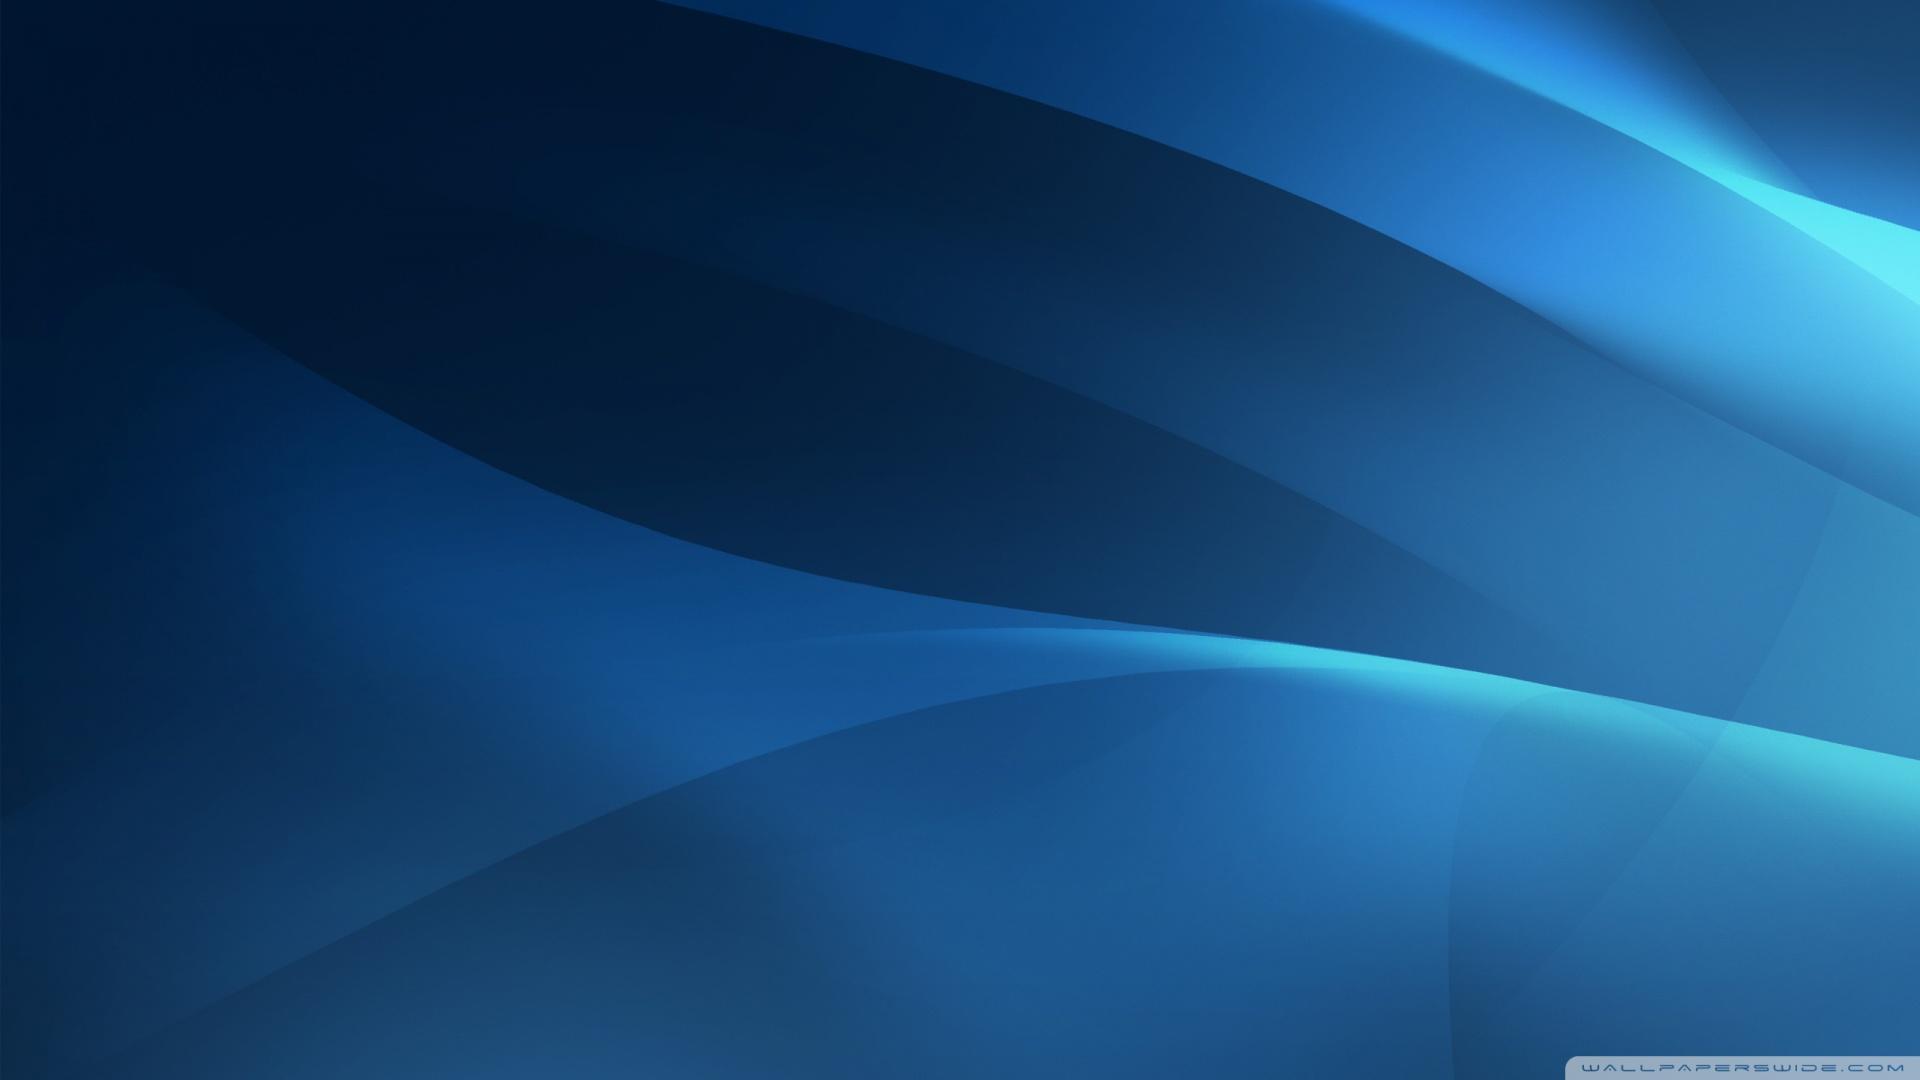 Hd Wallpaper 1920x1080 Black Blue: 1920X1080 Blue Wallpaper